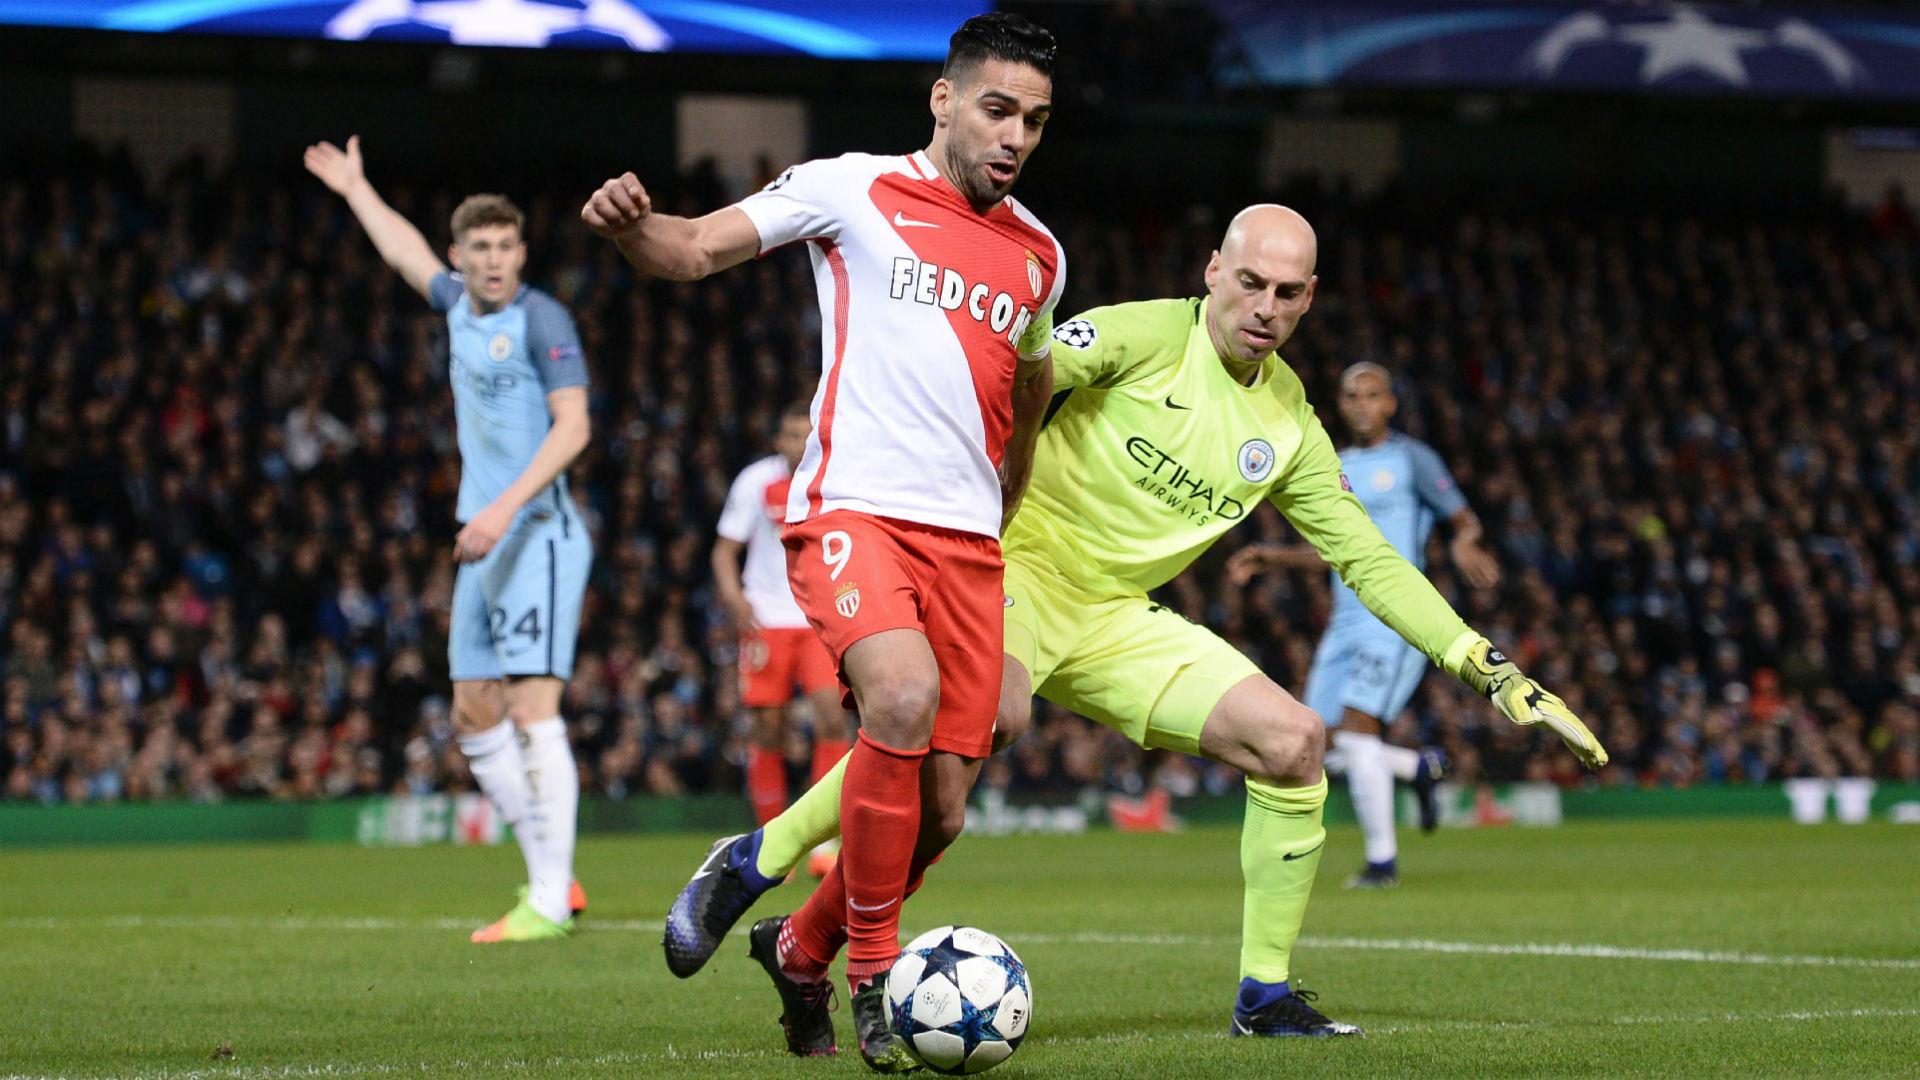 Radamel Falcao Monaco vs Manchester City 21022017